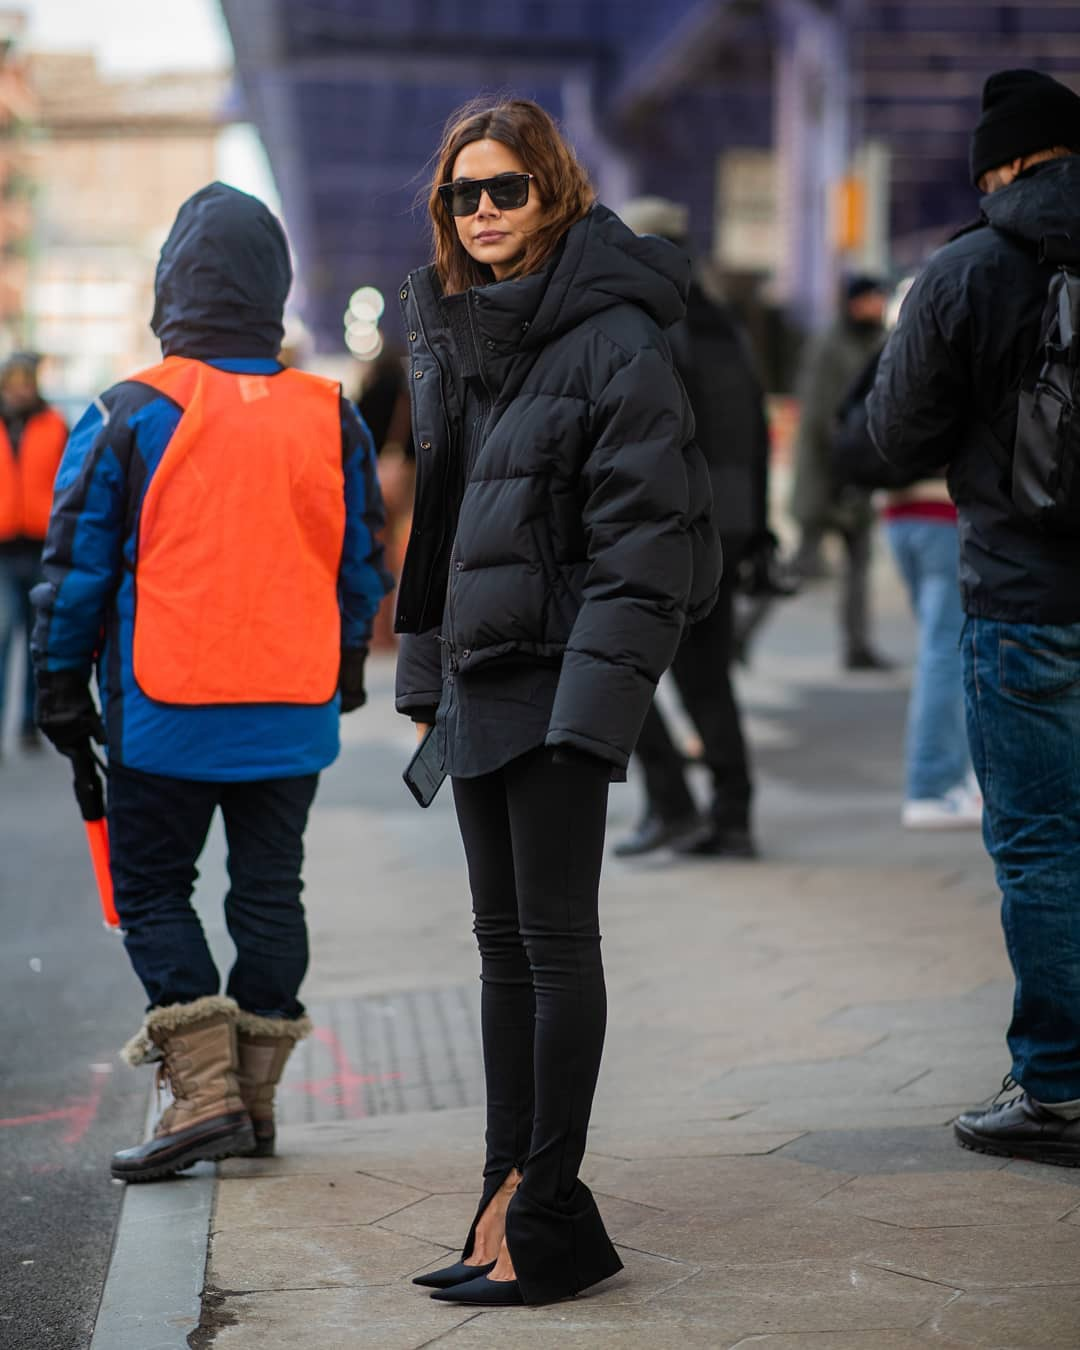 jacket puffer jacket black jacket black leggings pumps black shirt black sunglasses